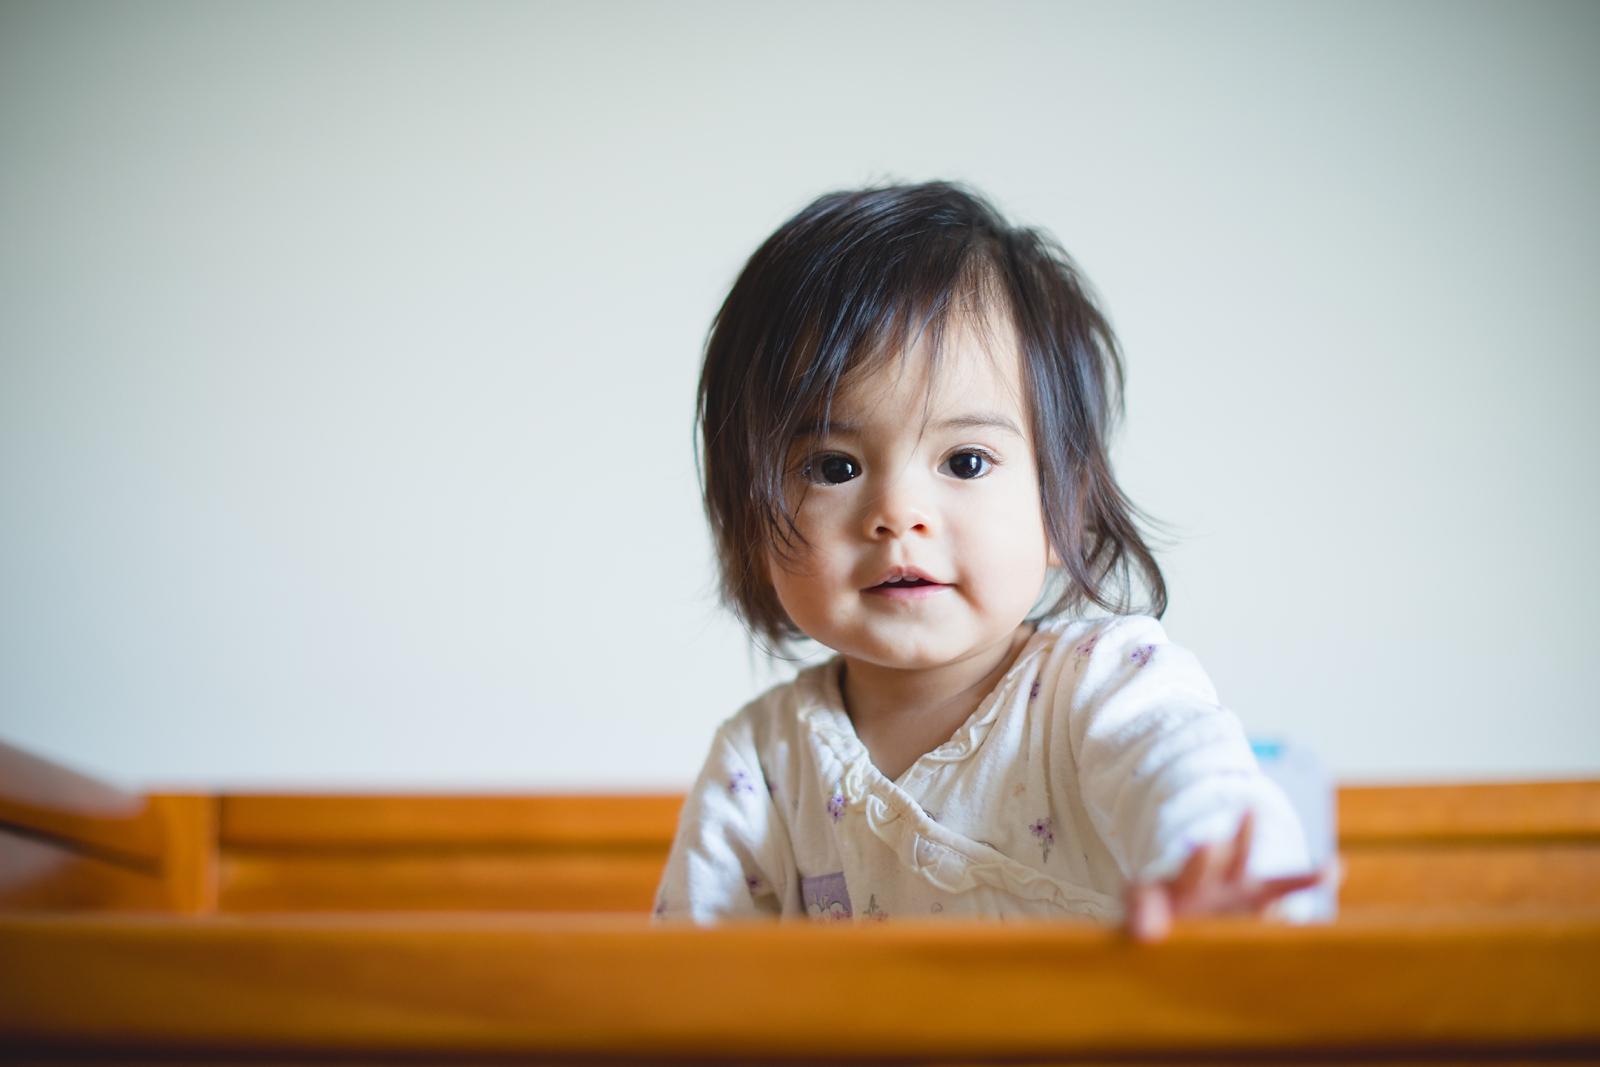 20130814-Amelia Stands in Crib-BLOGGrid_0001.jpg